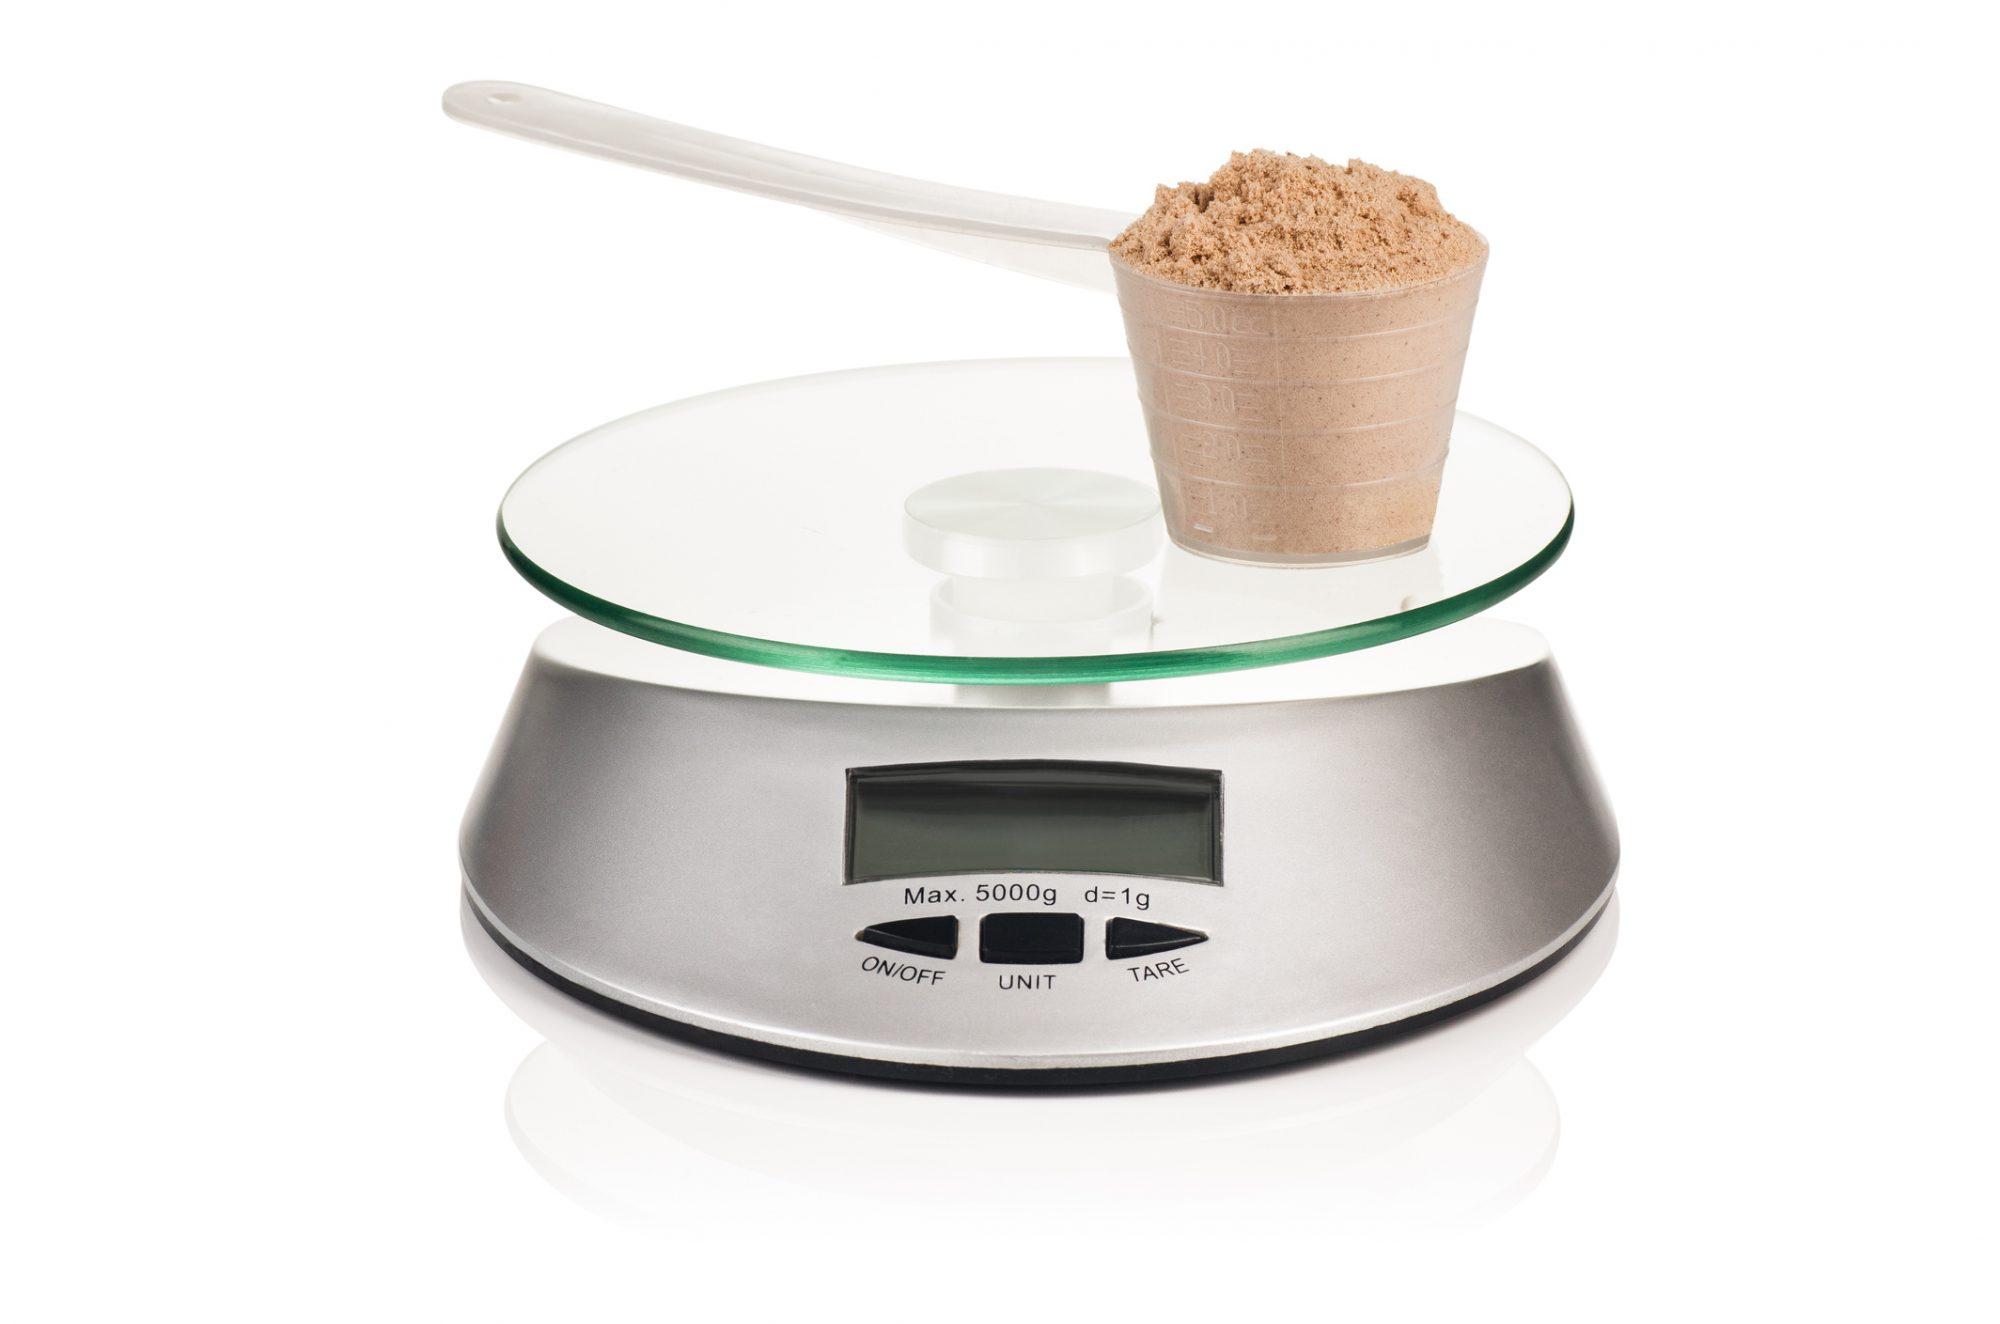 getty-digital-kitchen-scale-image